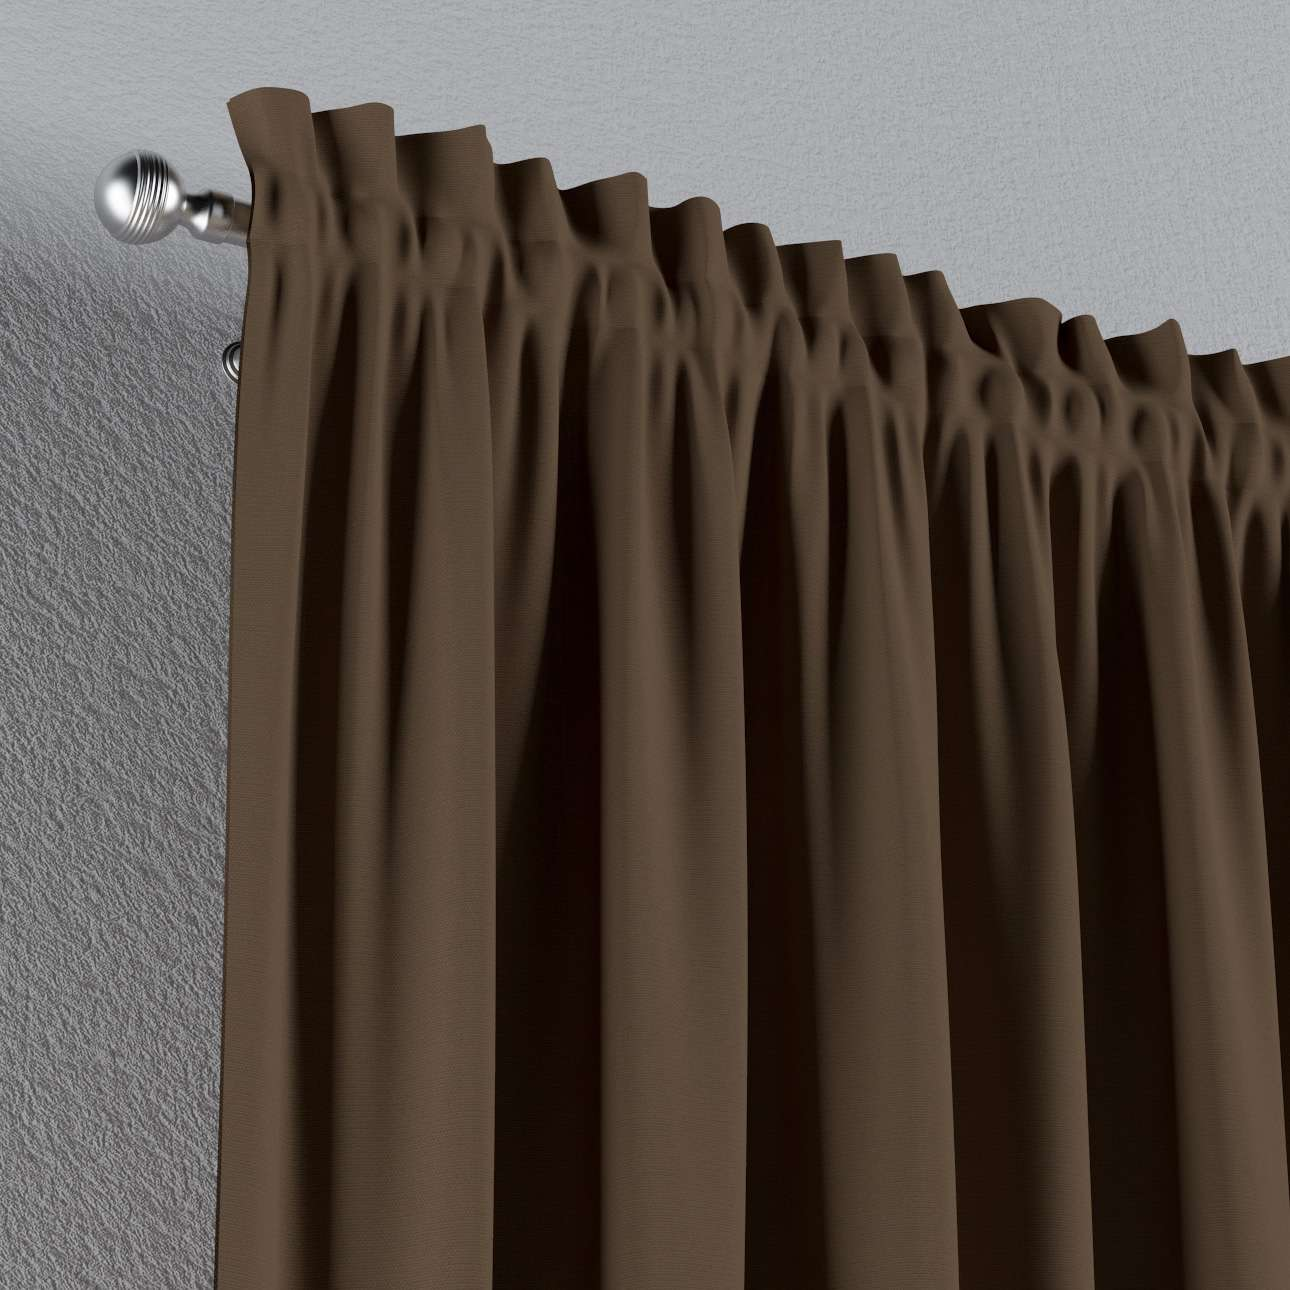 Gardin med kanal - Multiband 1 längd i kollektionen Panama Cotton, Tyg: 702-02